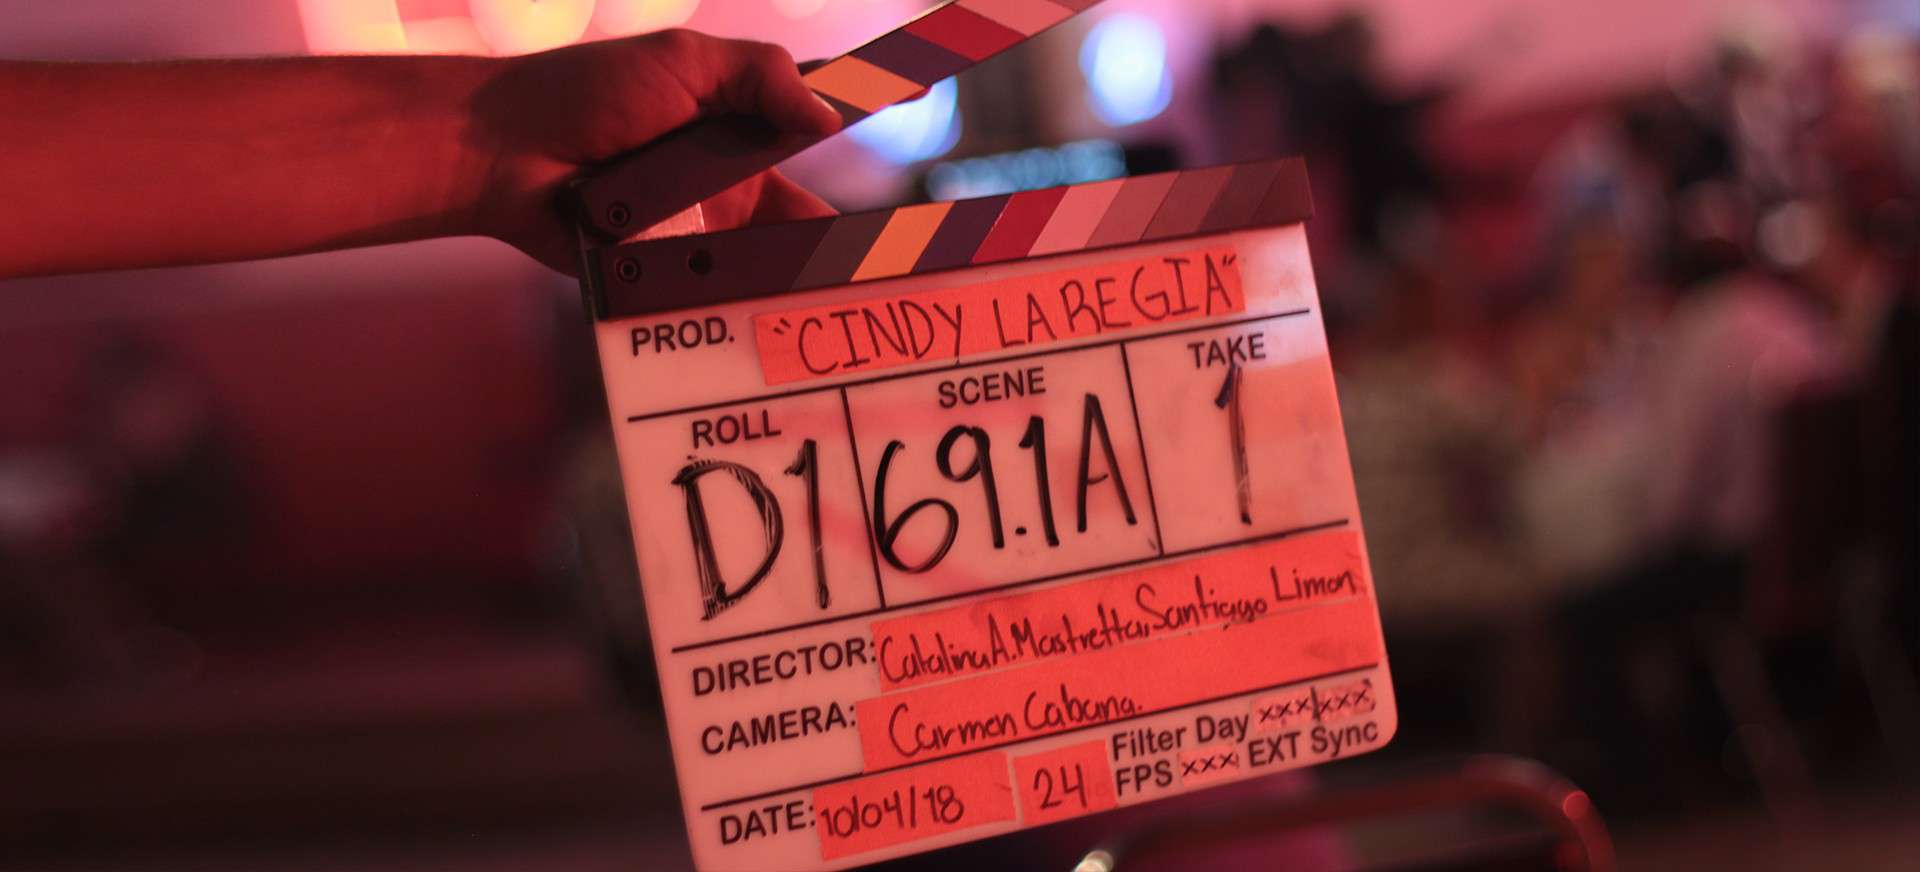 Cindy la Regia llega al cine